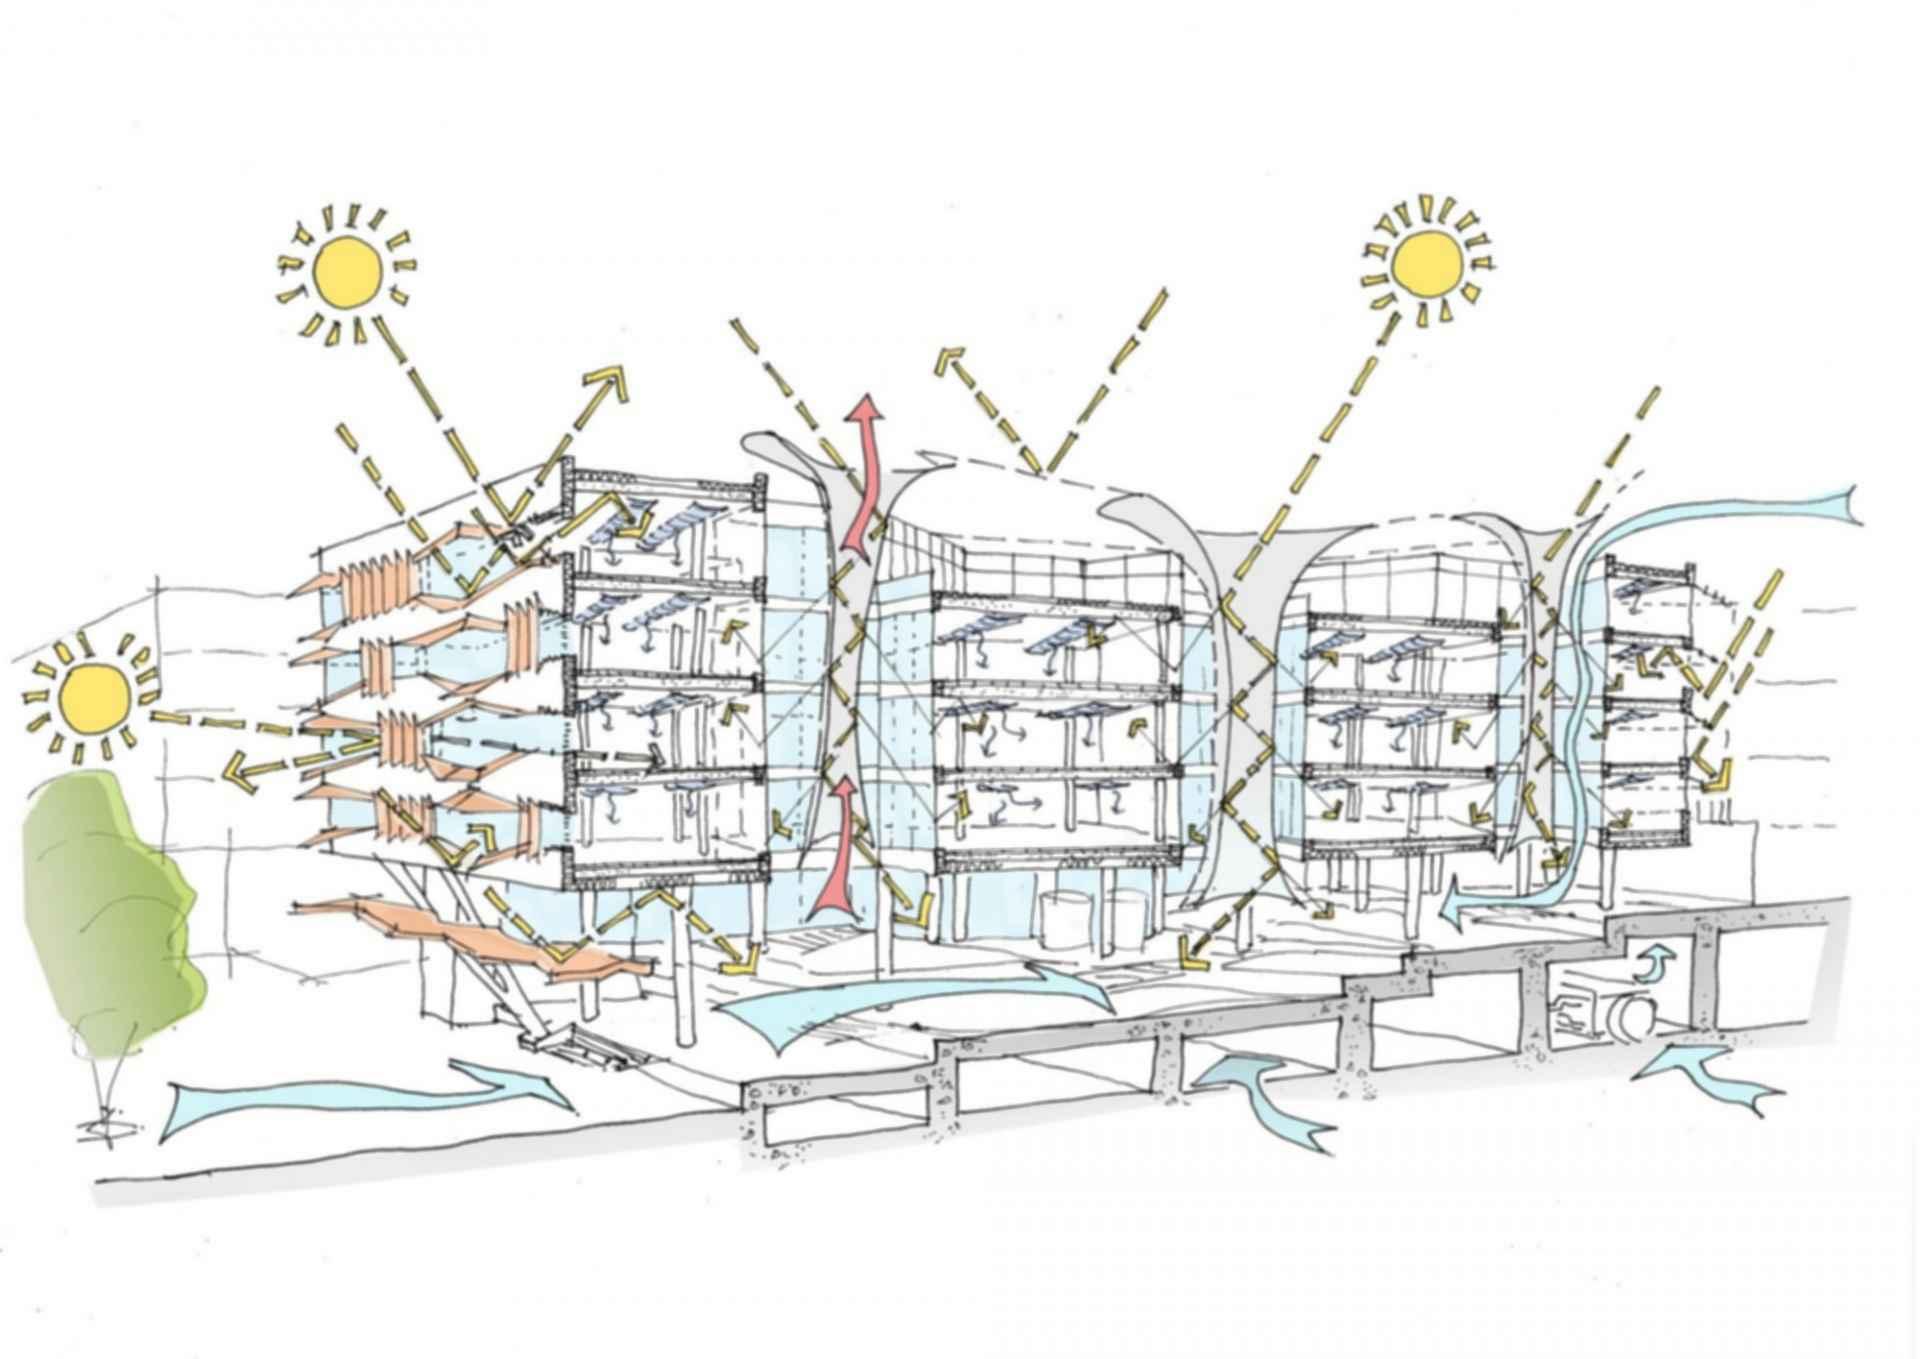 Siemens HQ in Masdar City - Concept Drawings